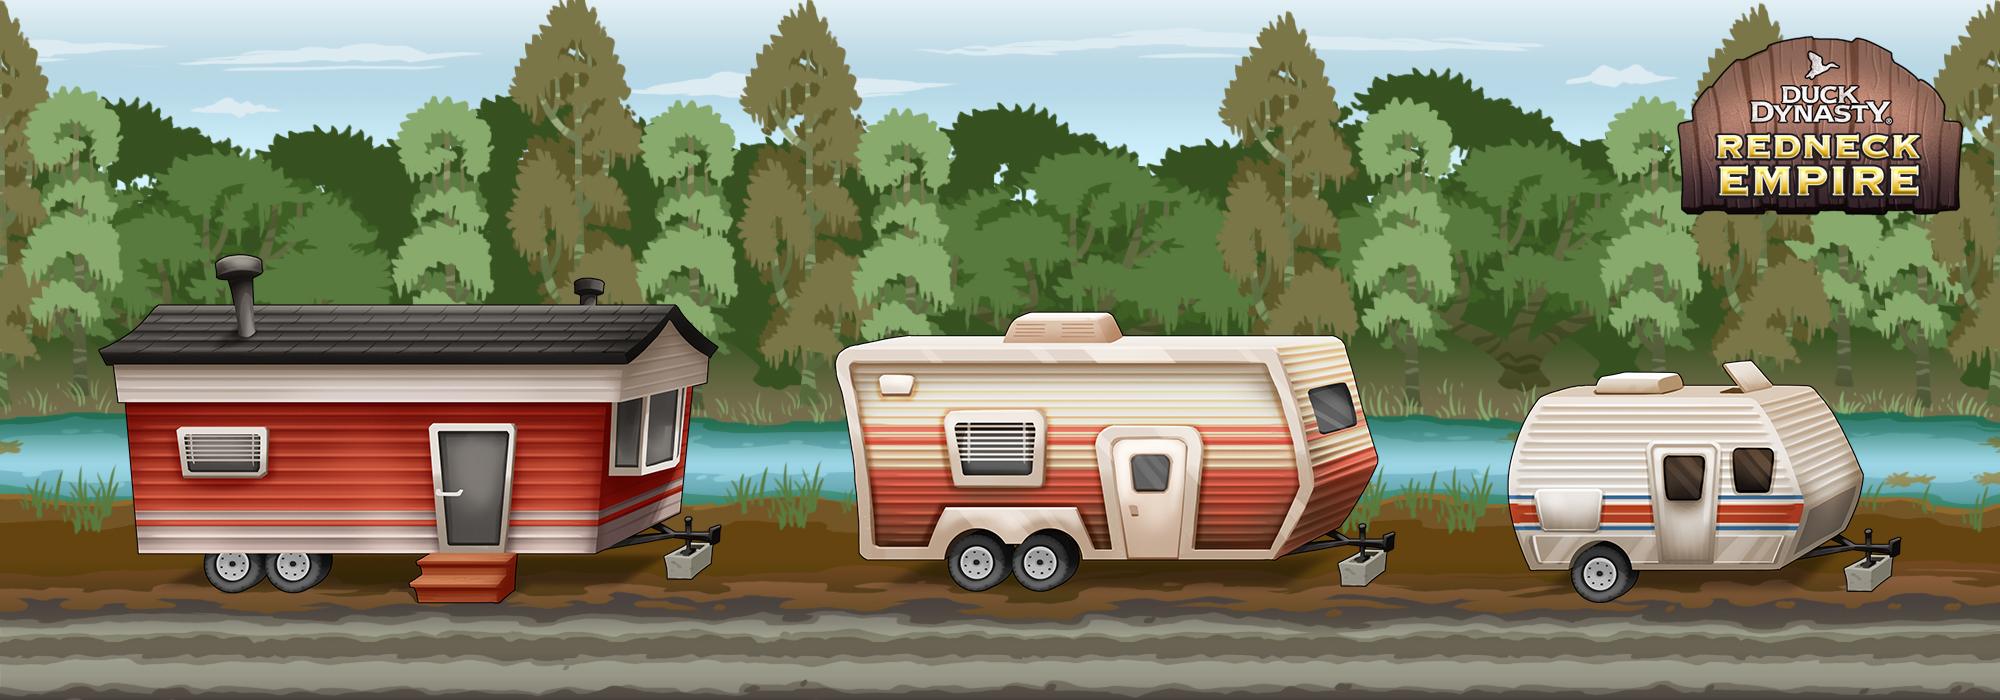 Duck Dynasty Redneck Empire — Jeremy Vinar - Comic Artist on top gear mobile homes, sherlock mobile homes, duck commander mobile homes, dynasty modular homes,